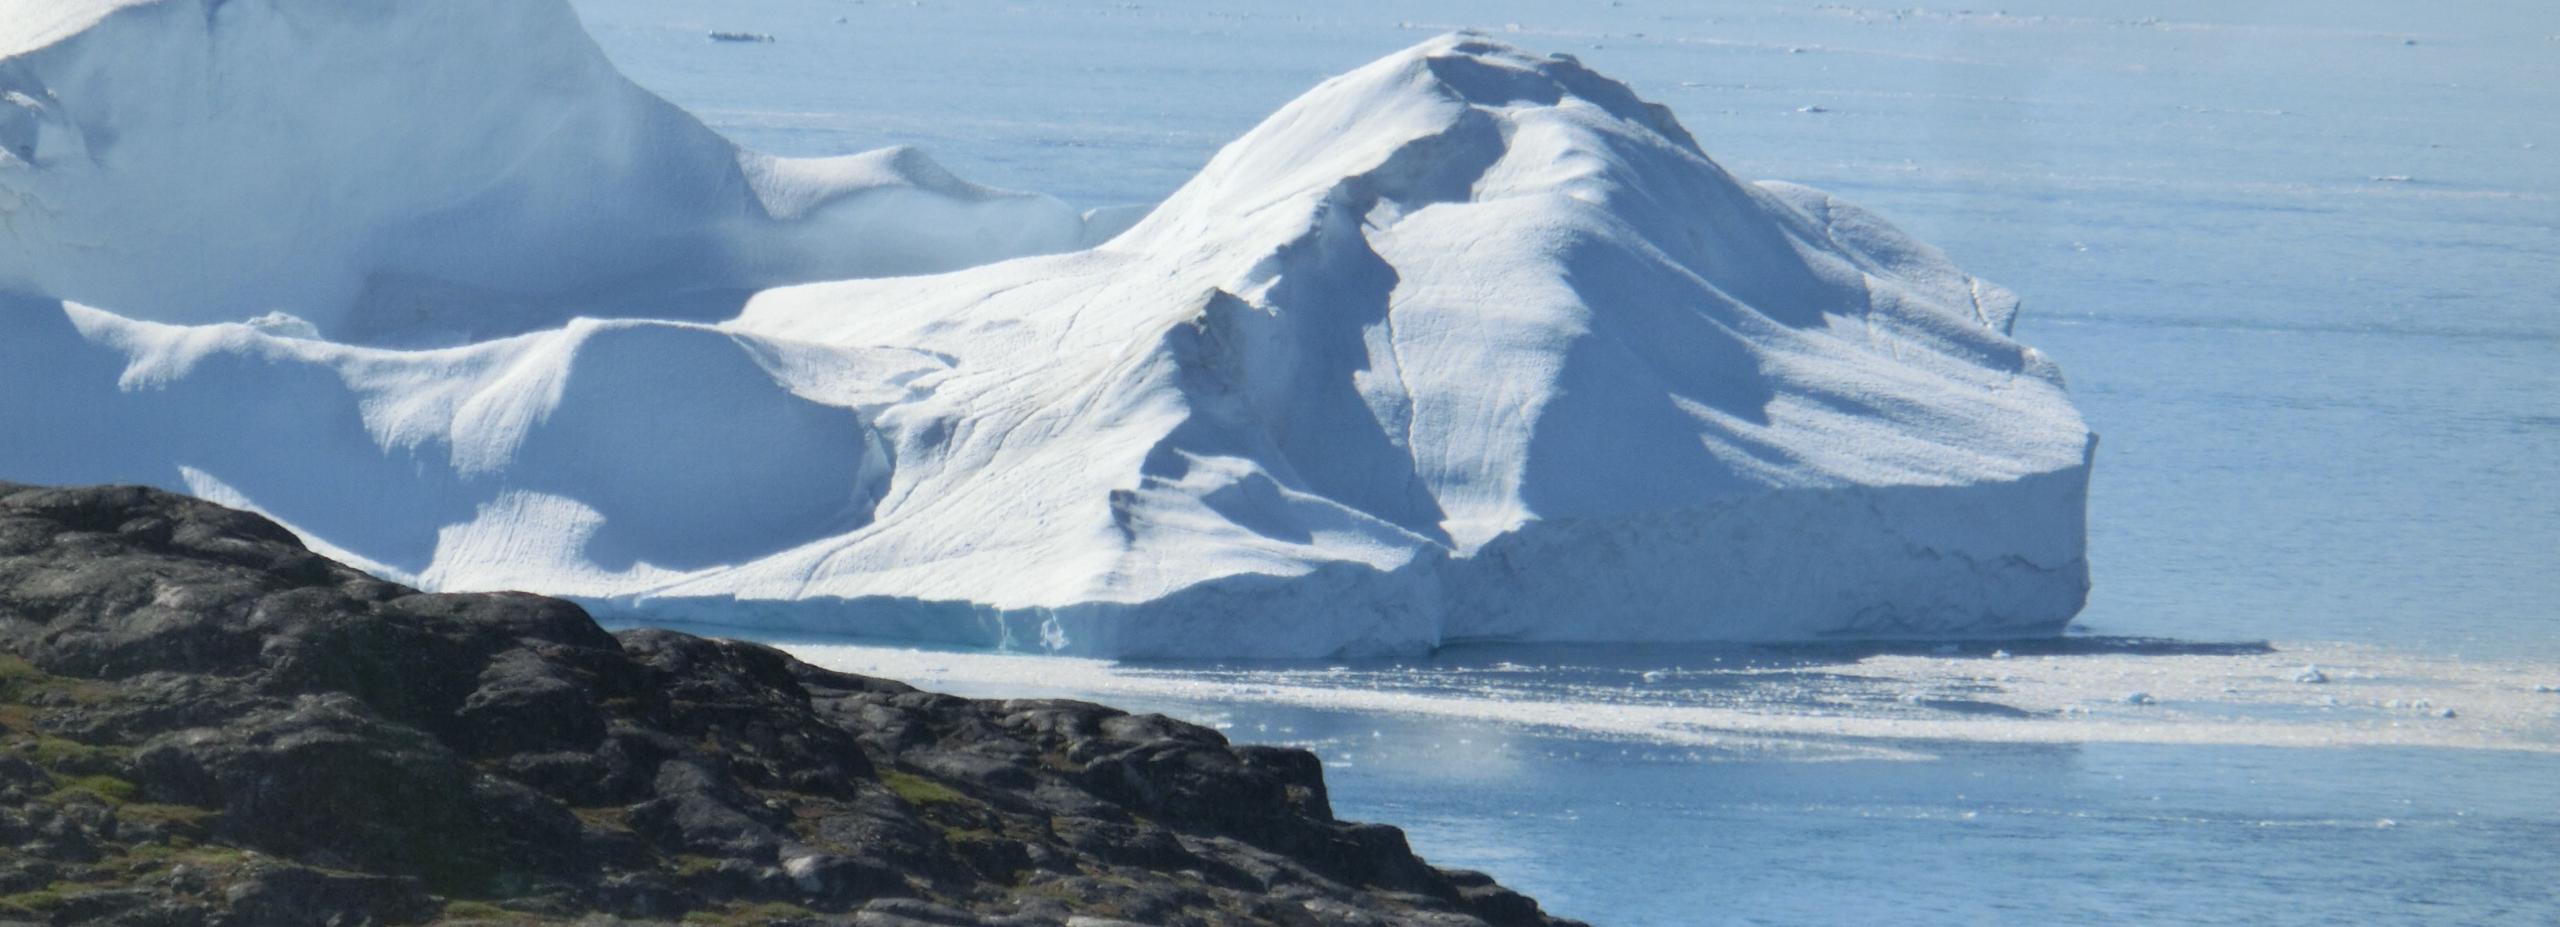 Neuer IPCC-Bericht